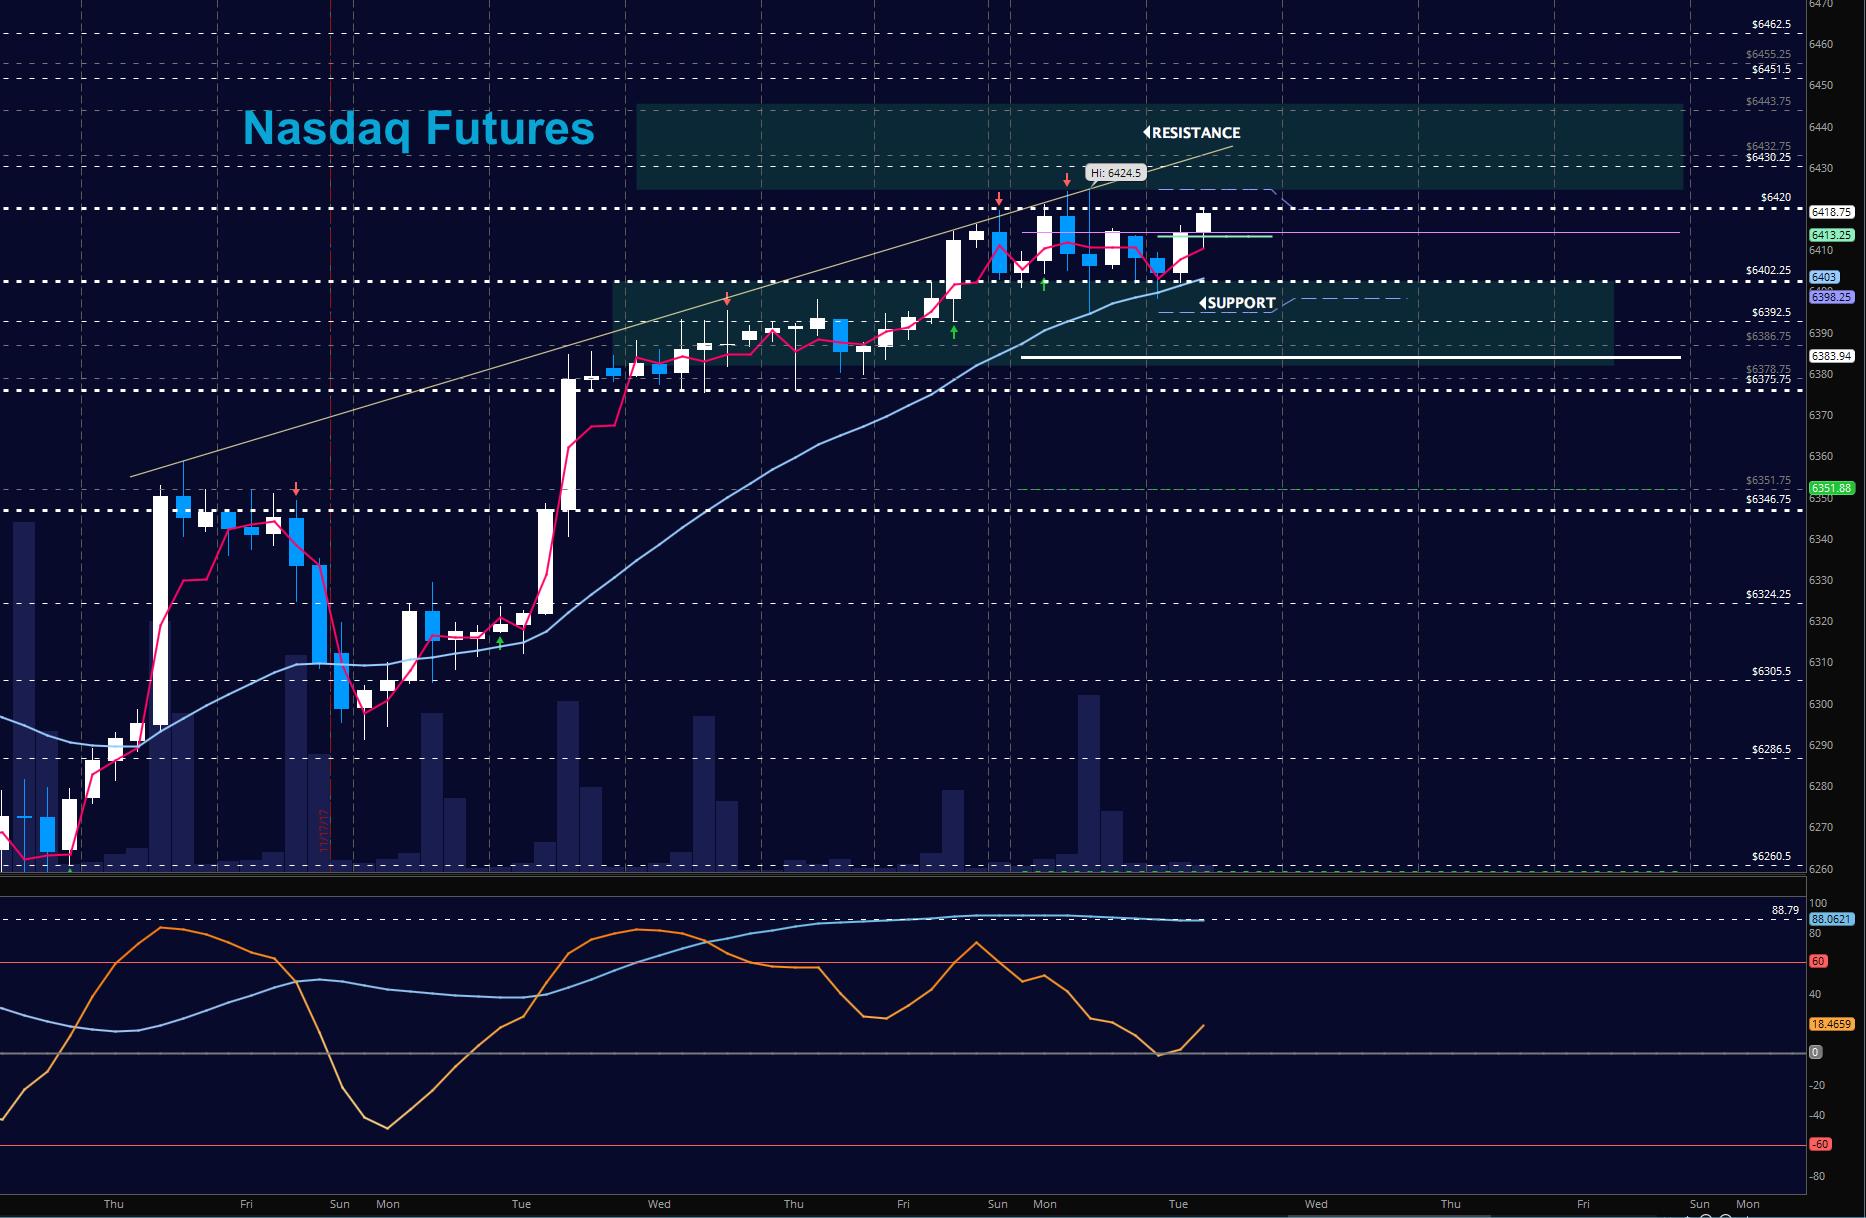 nasdaq futures trading update_price chart_november 28_news_investing_markets